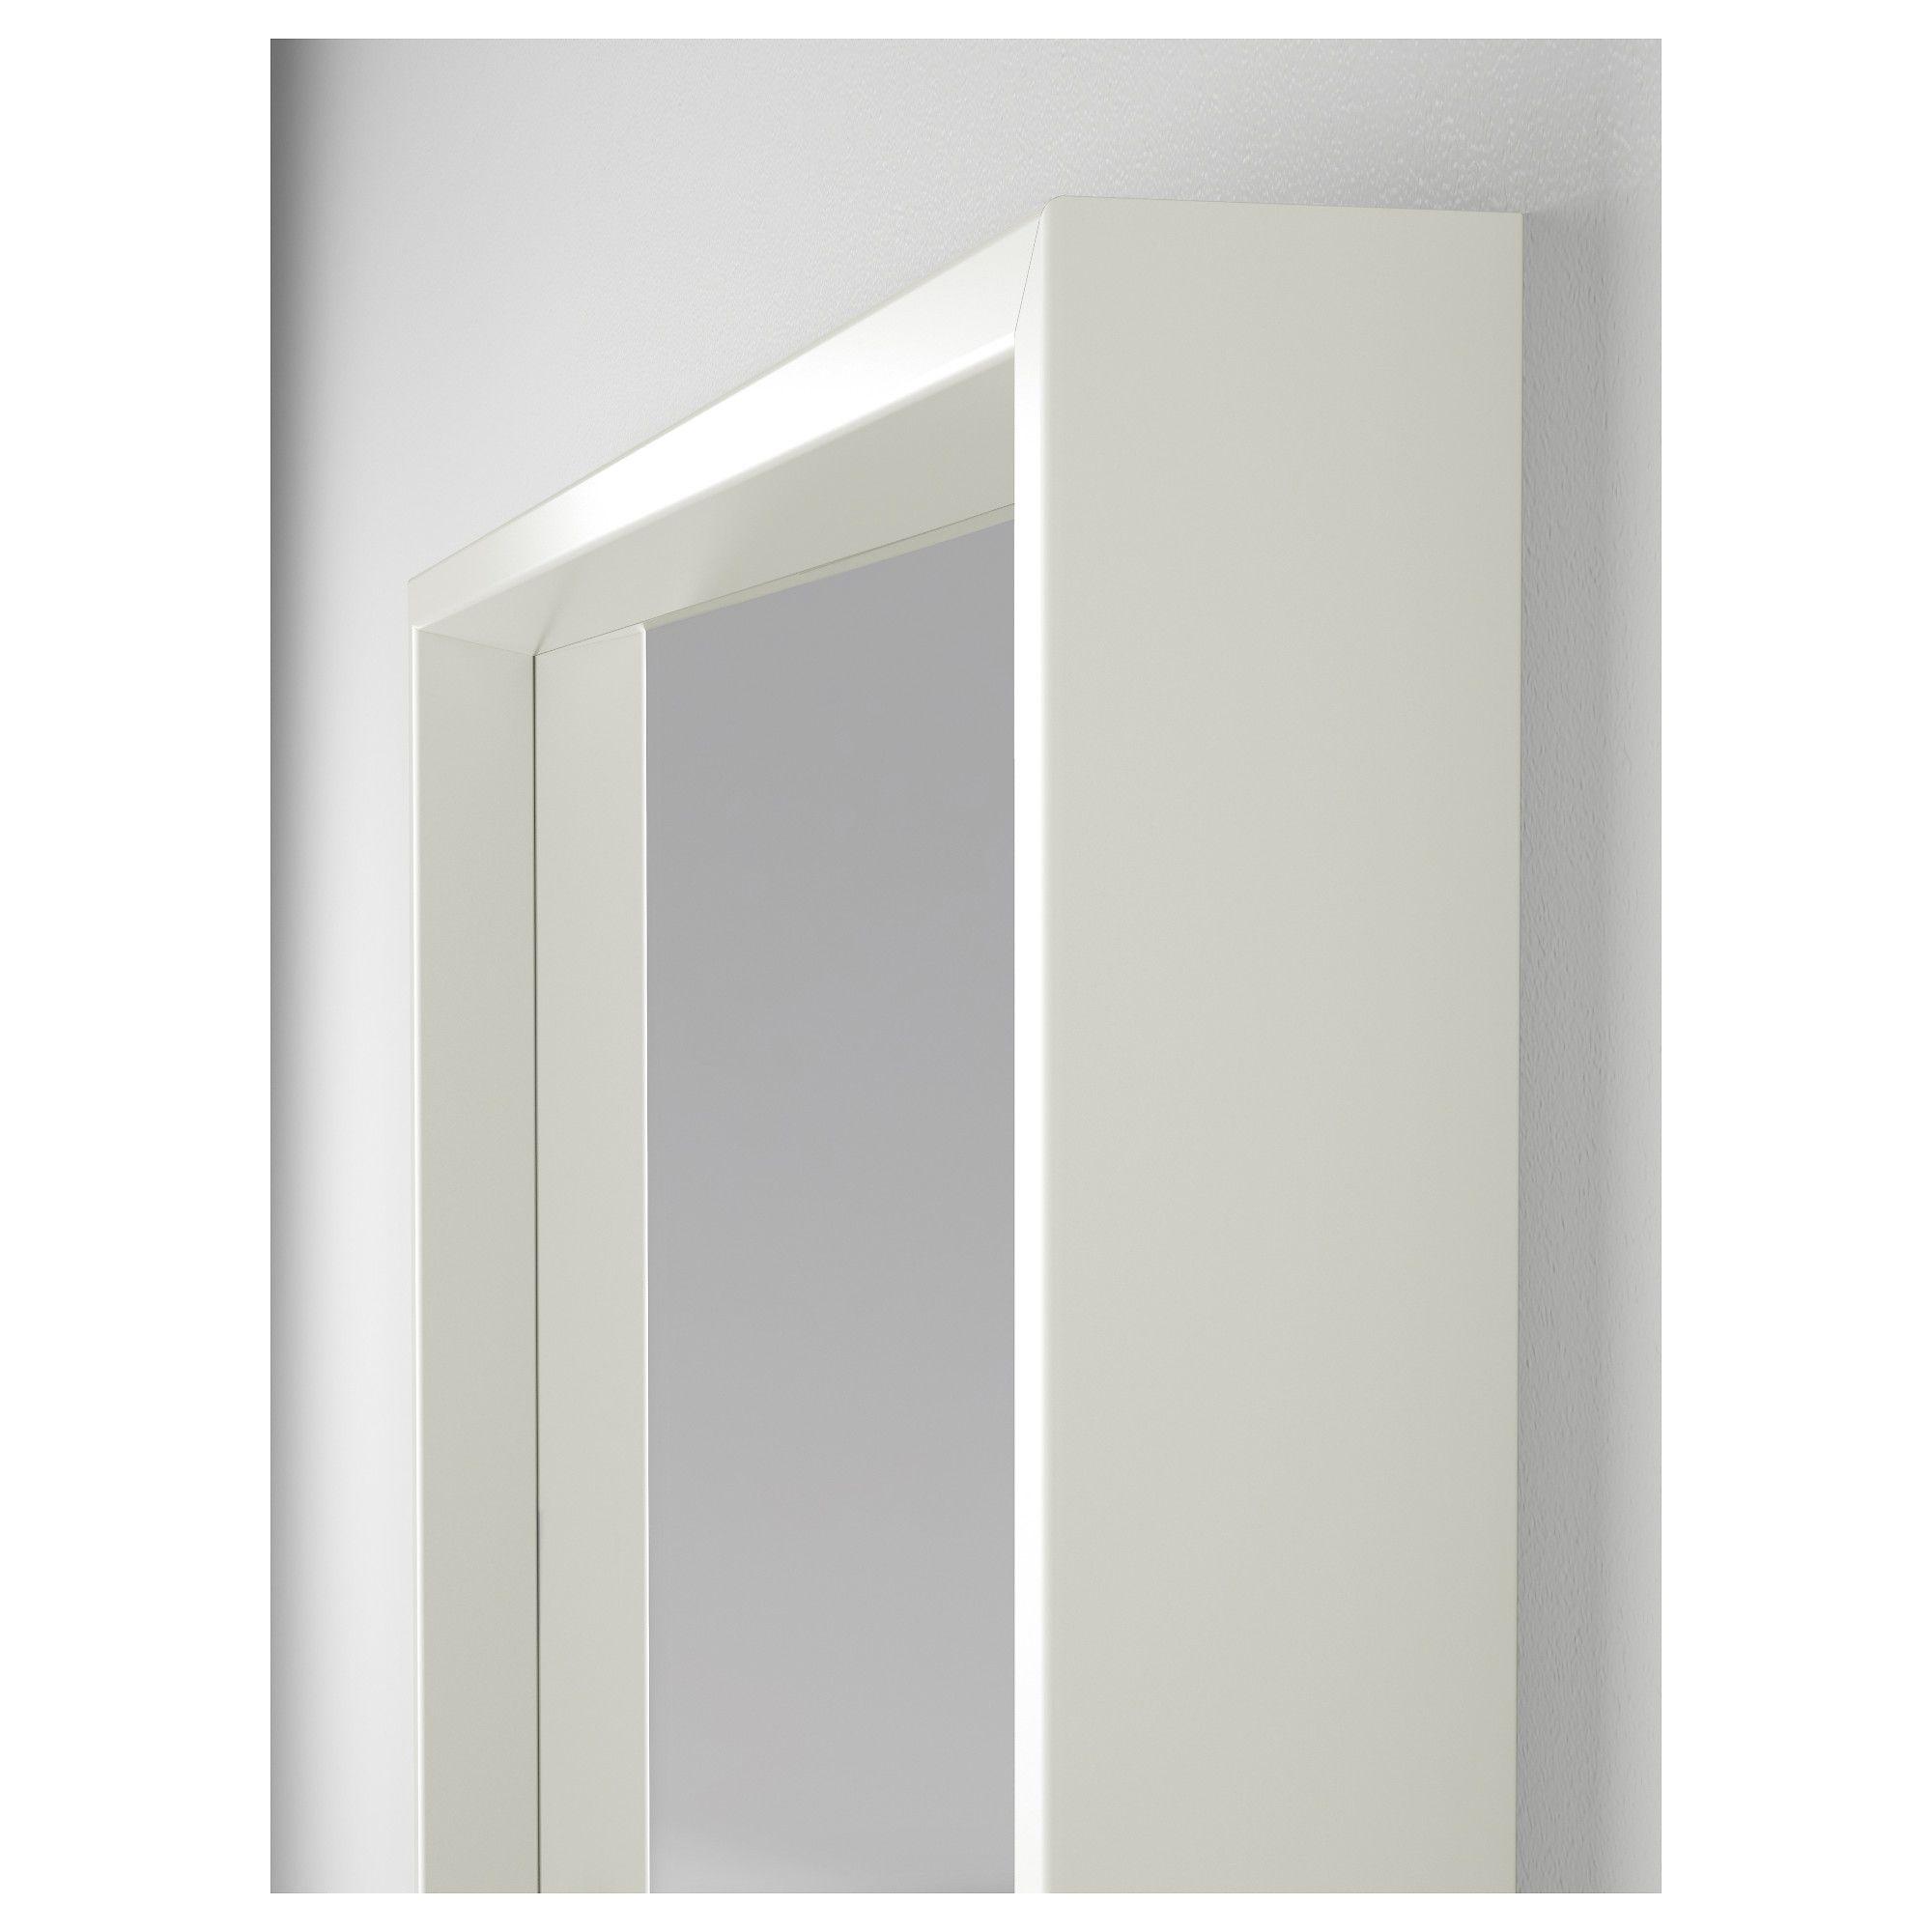 nissedal mirror white 65x65 cm | glass, decoration and bedrooms, Hause deko